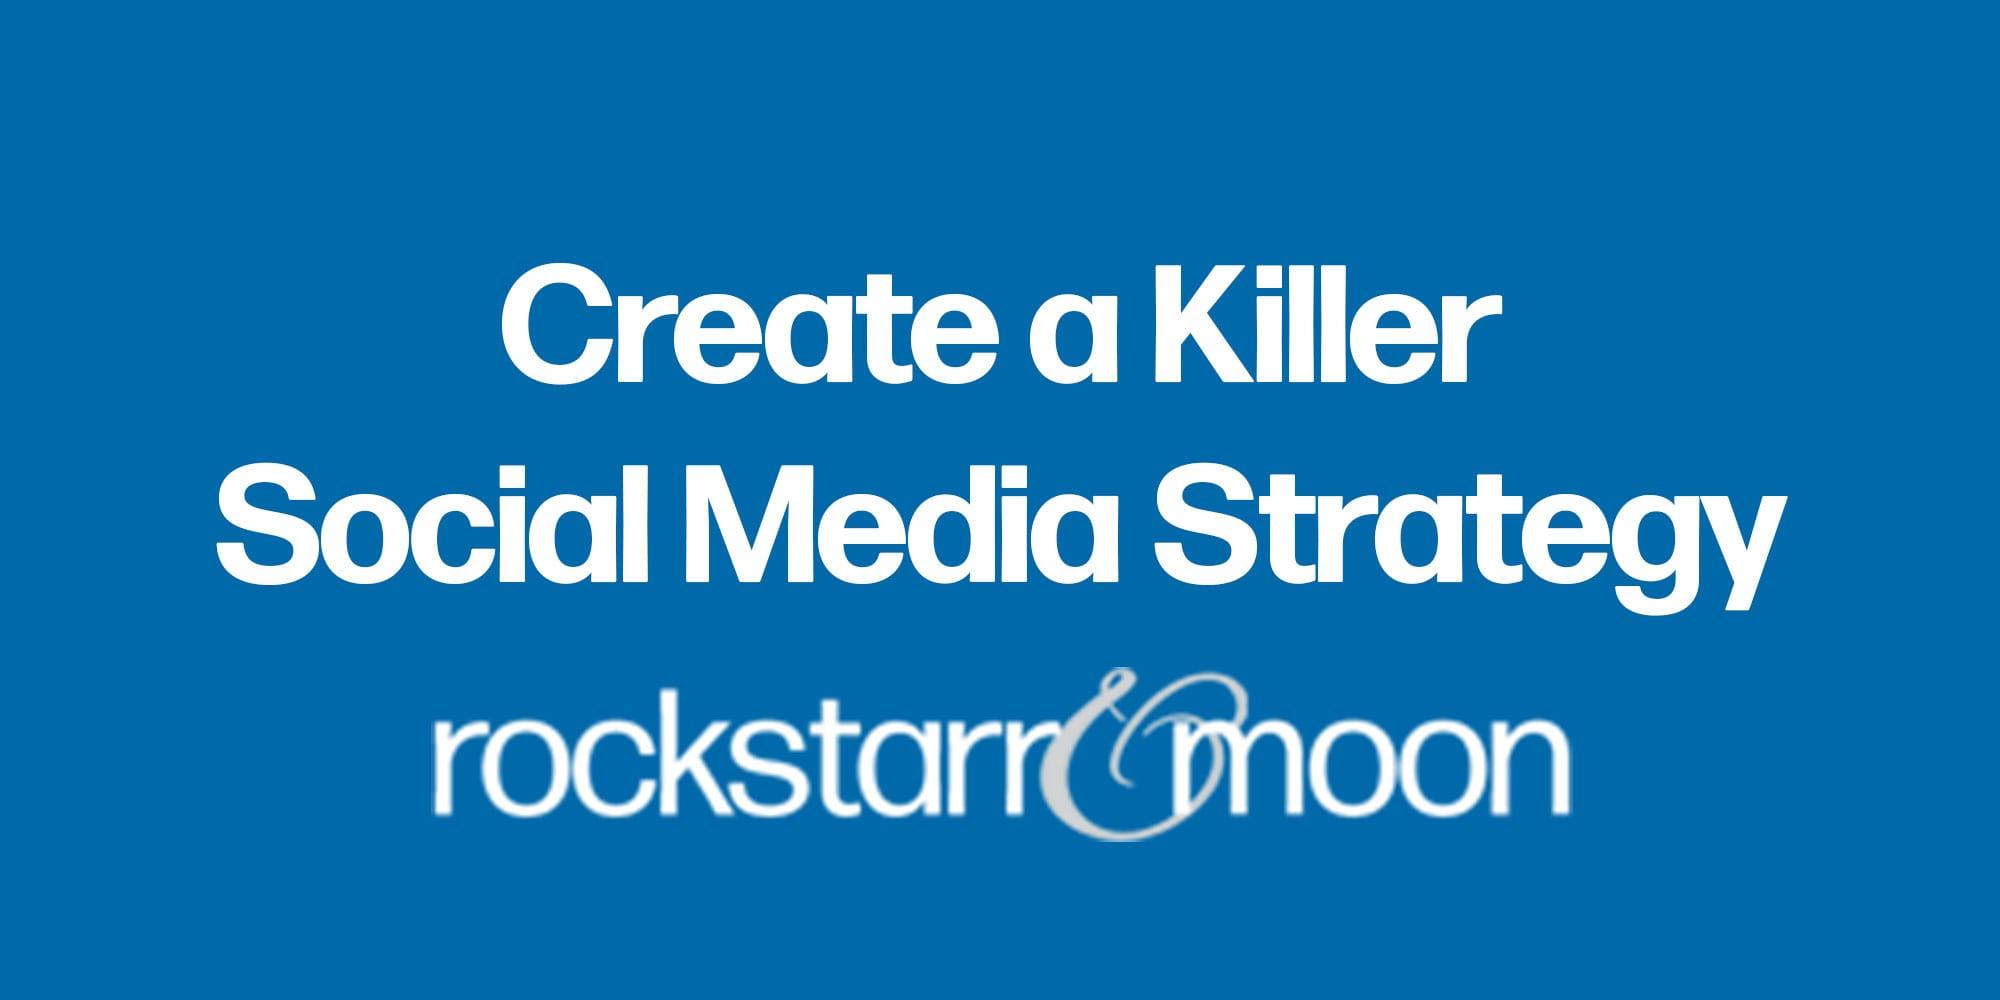 8 Easy Steps to Creating a Killer Social Media Strategy